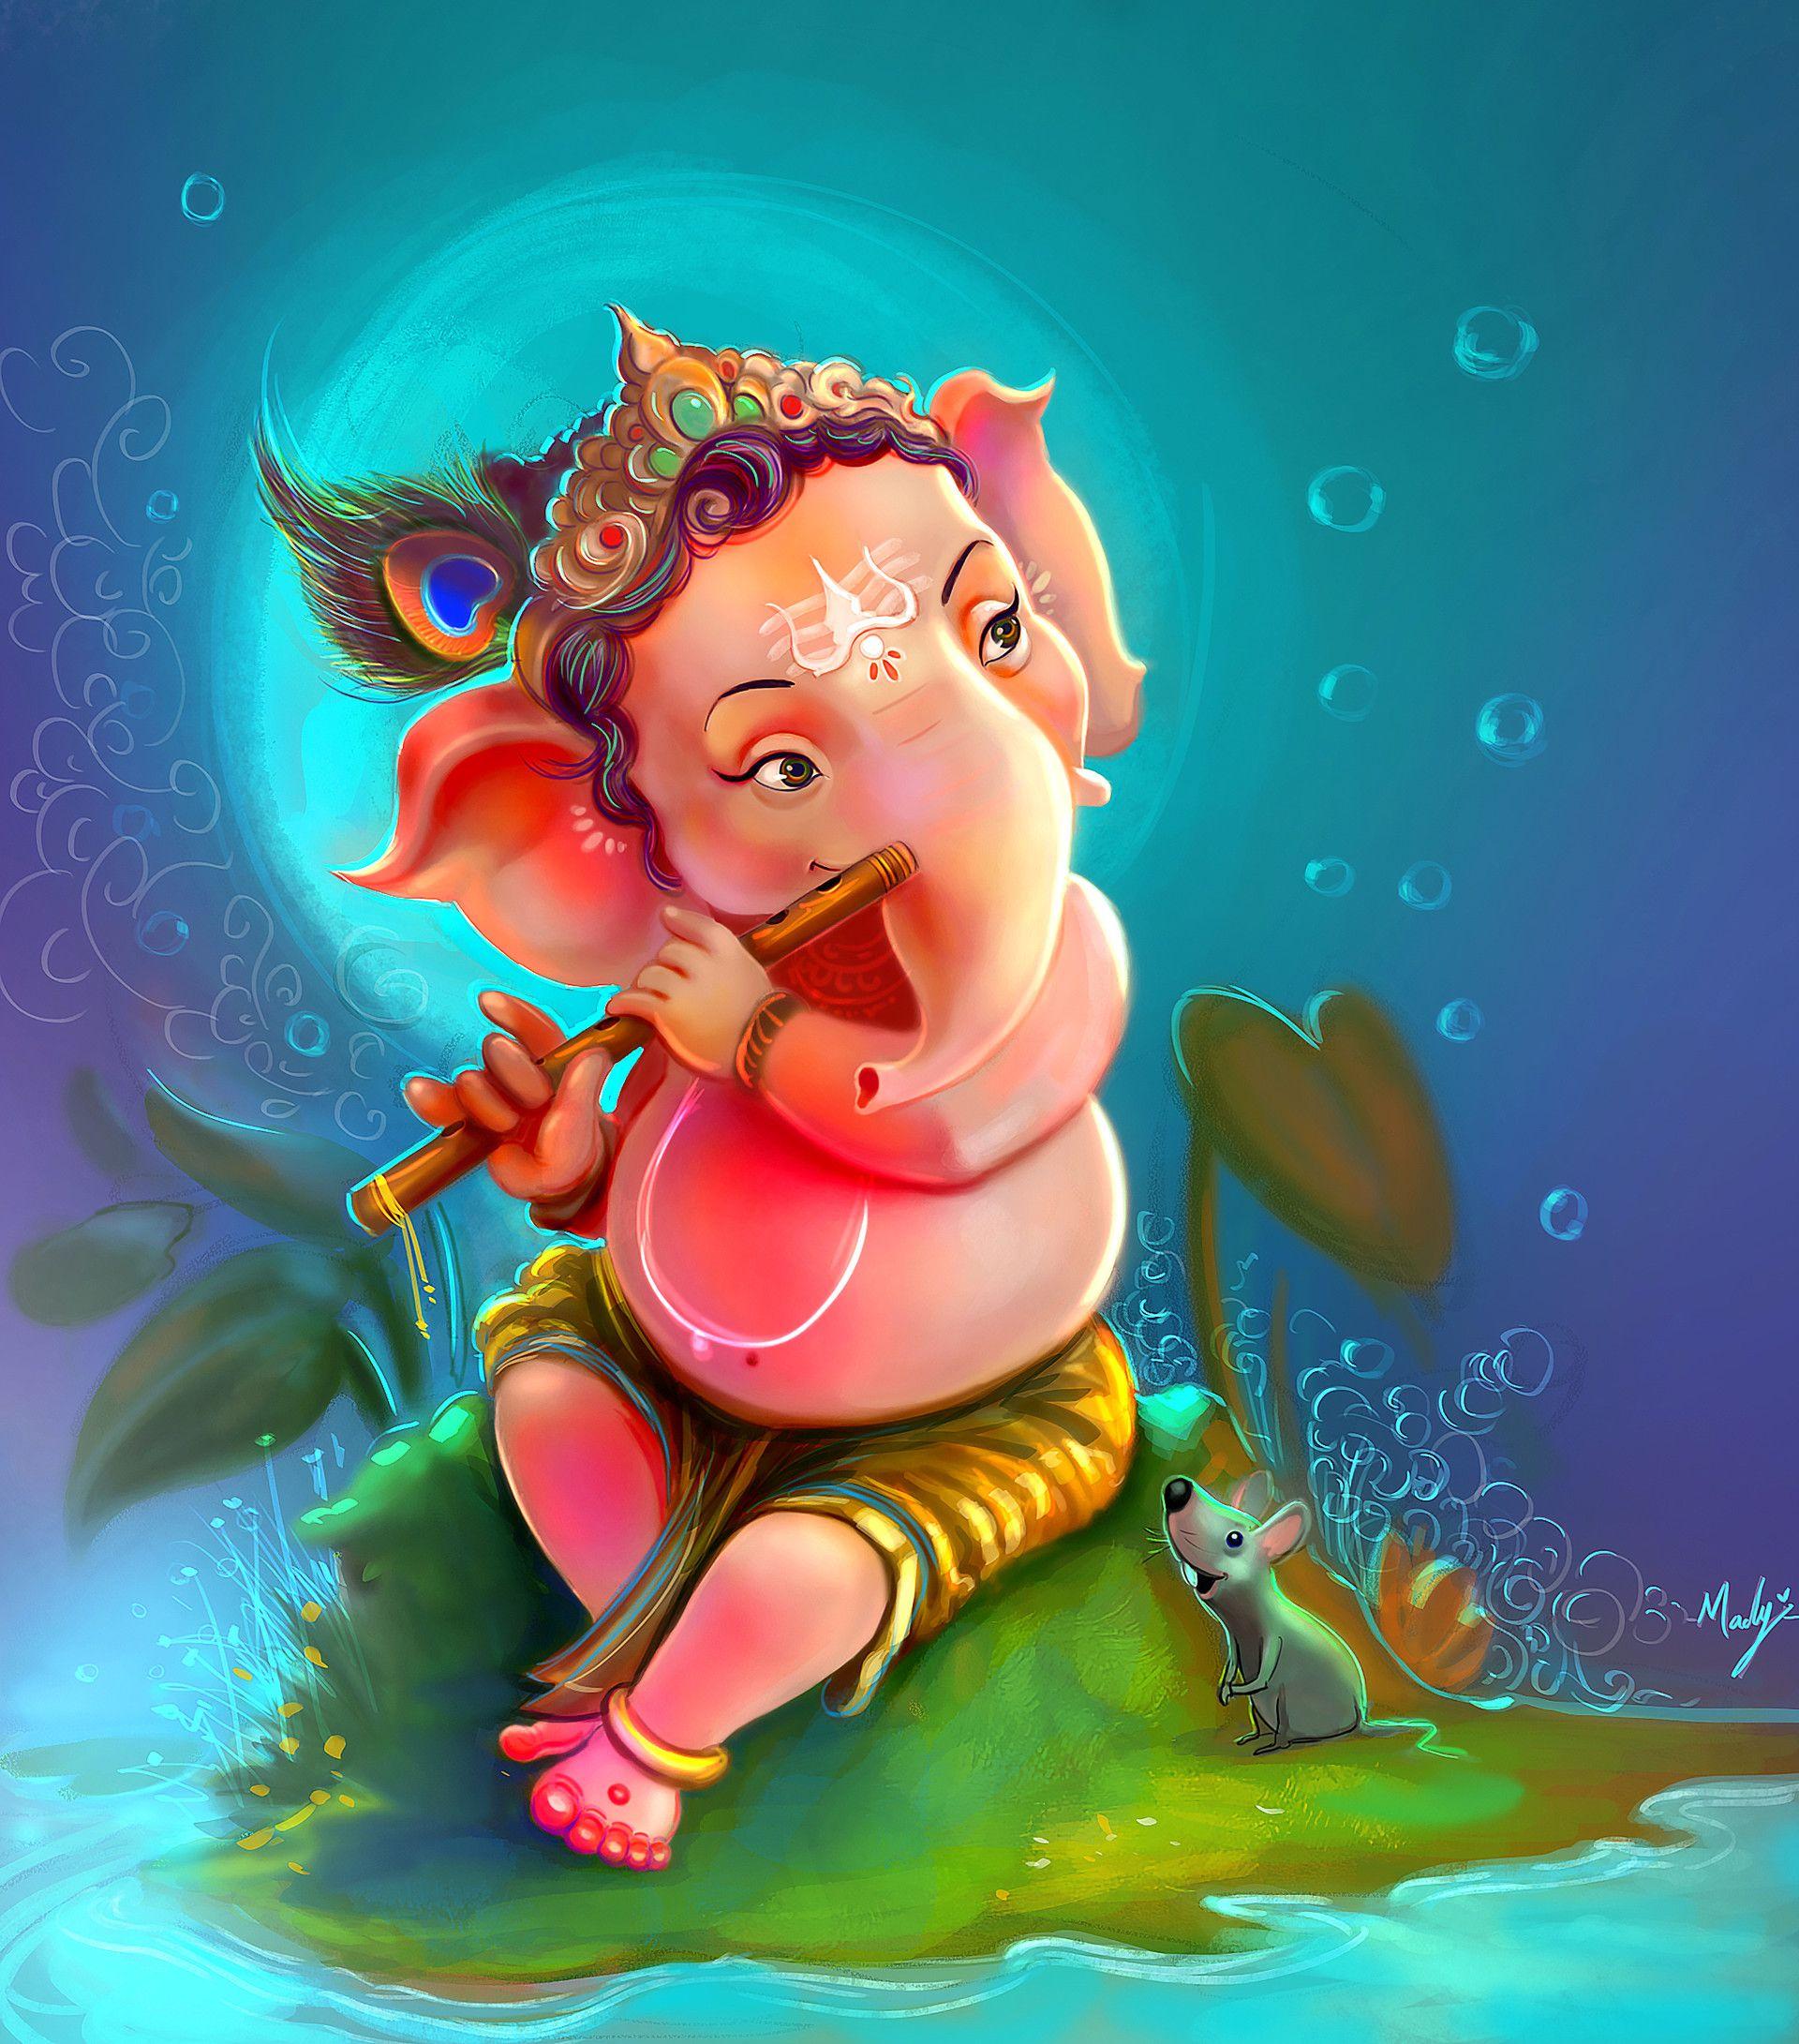 madhaw-bauri-ganesha.jpg (1920×2181) | Happy ganesh chaturthi images, Ganesha pictures, Ganesh chaturthi images